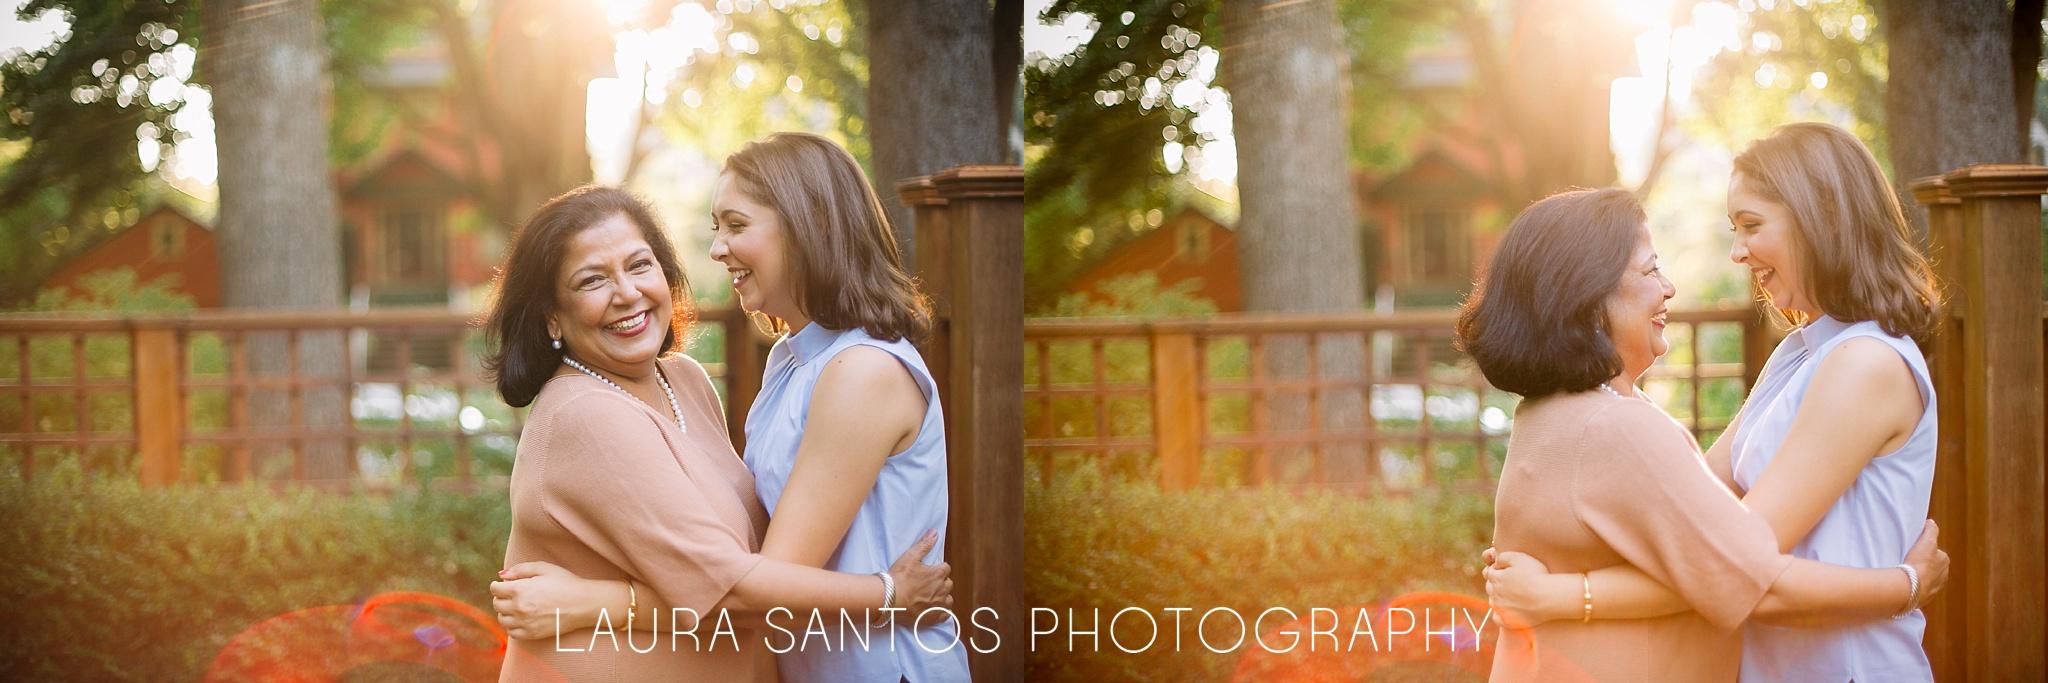 Laura Santos Photography Portland Oregon Family Photographer_0438.jpg